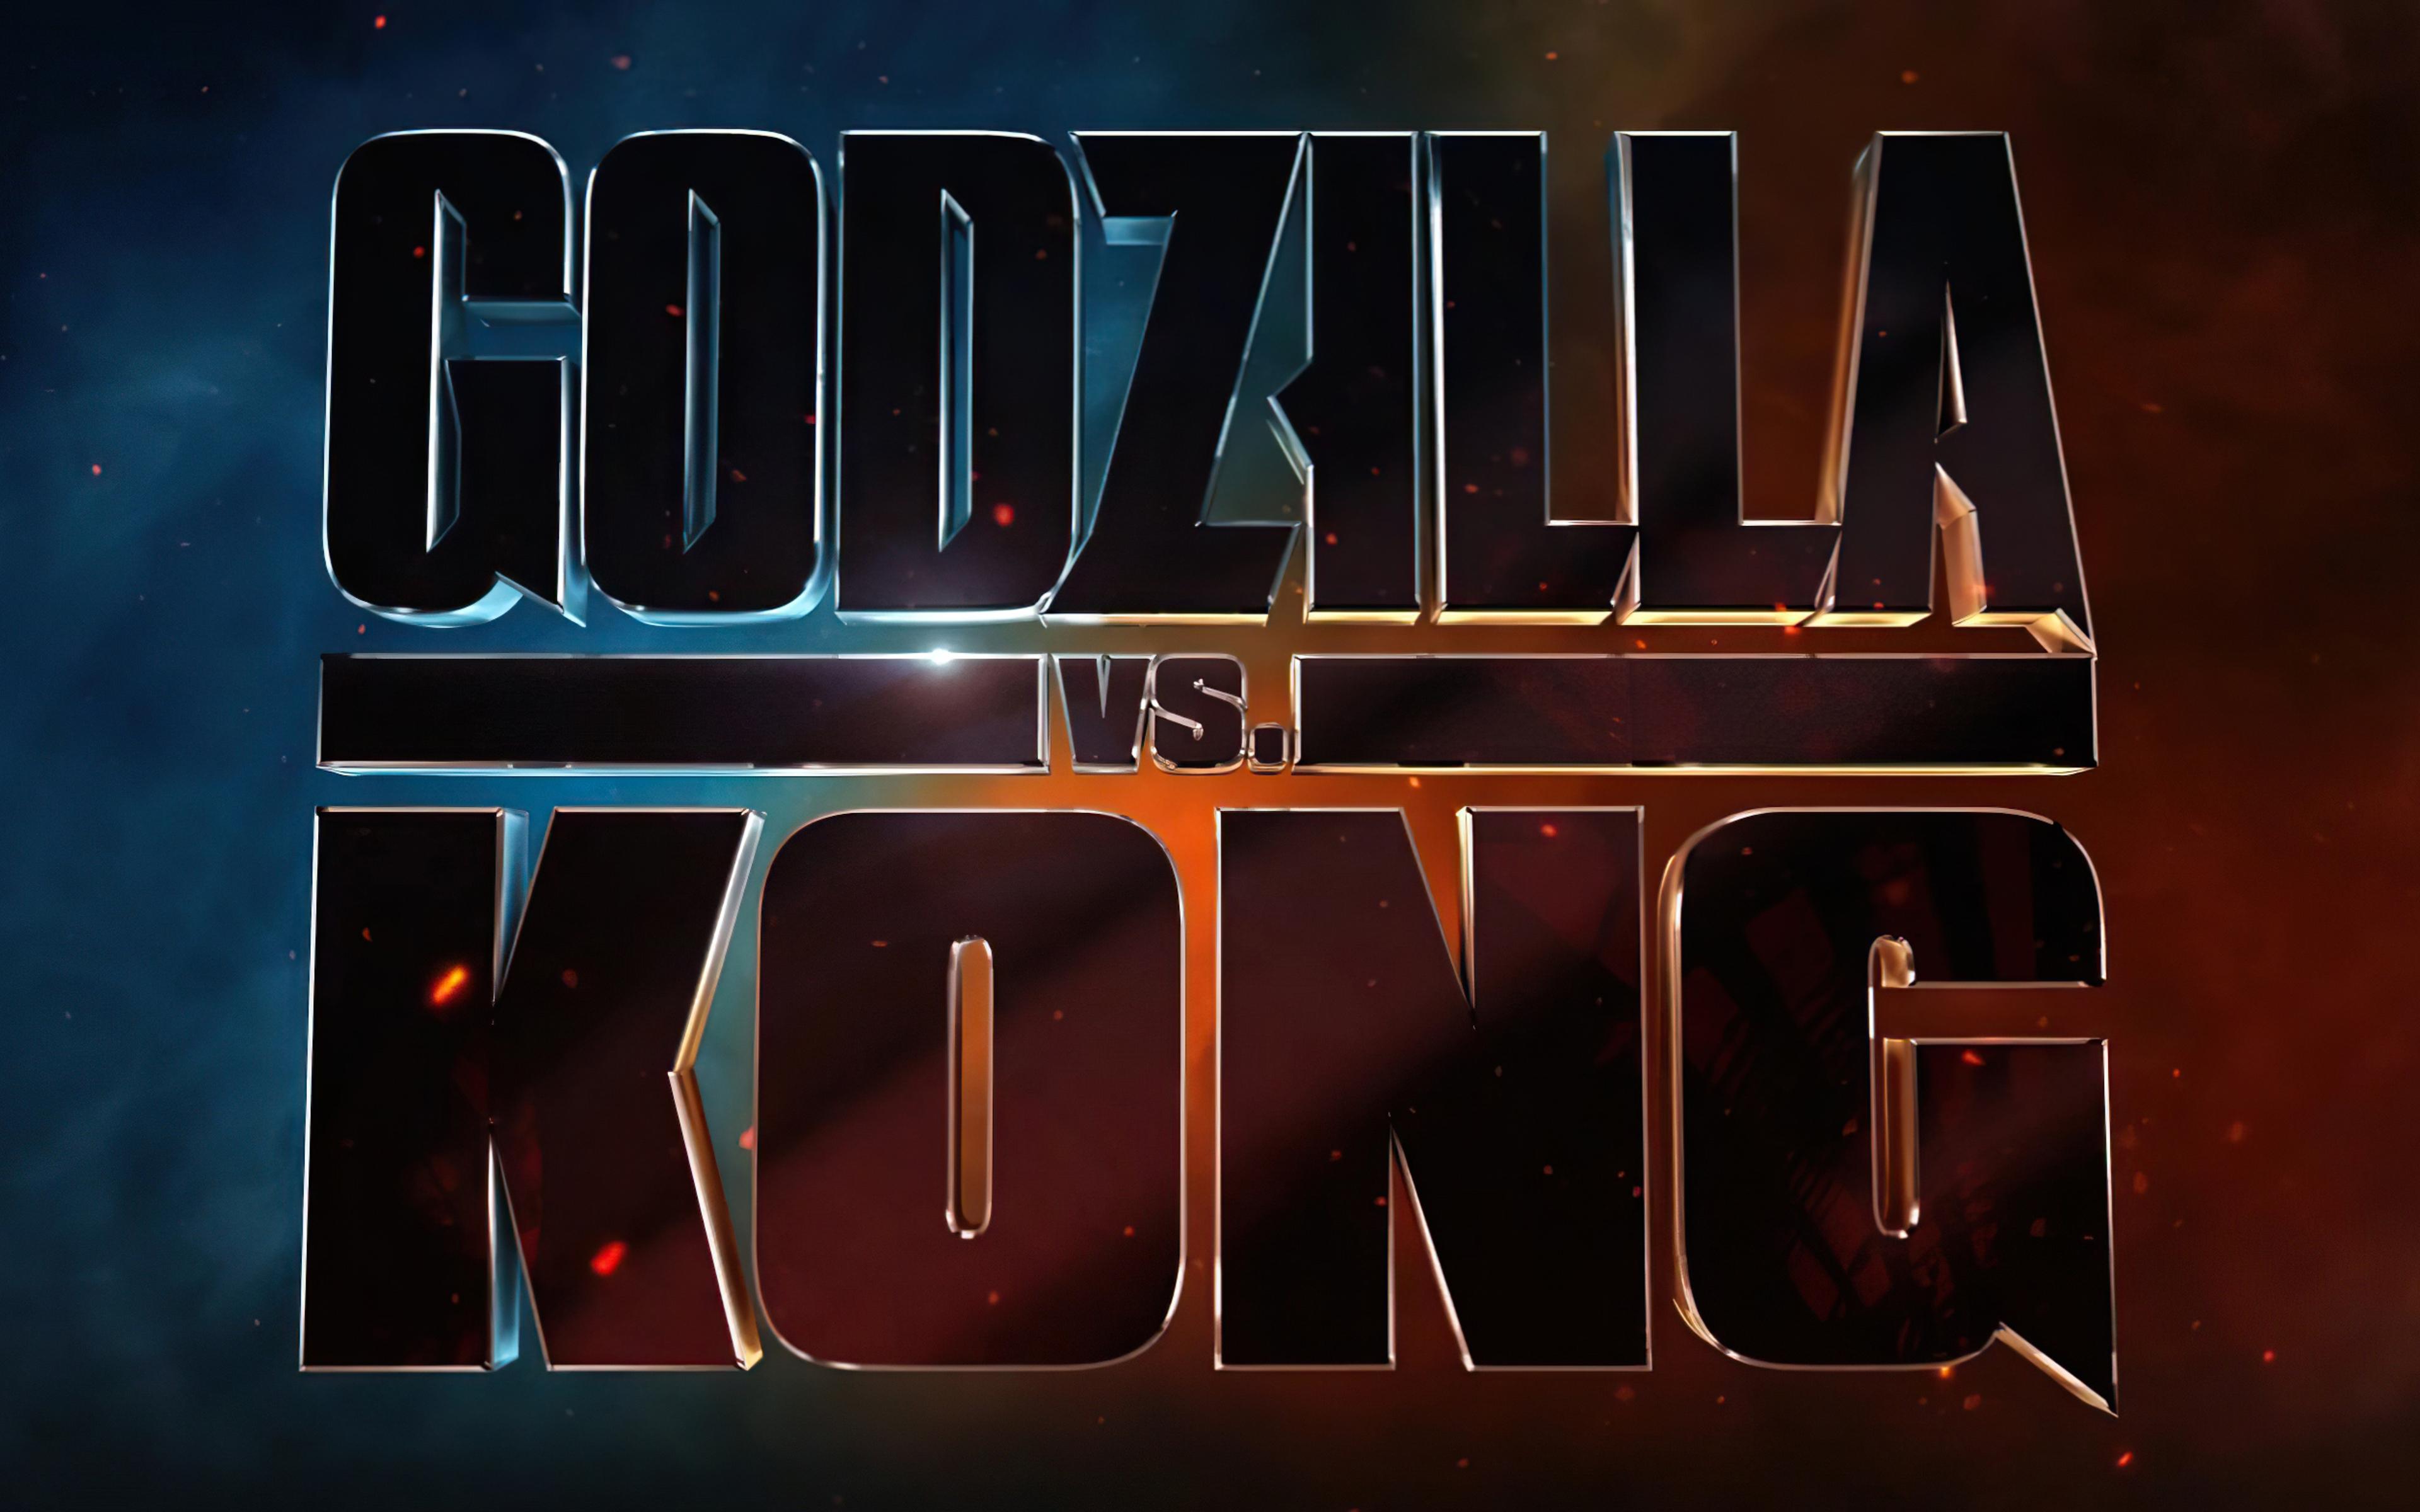 godzilla-vs-kong-2021-sj.jpg